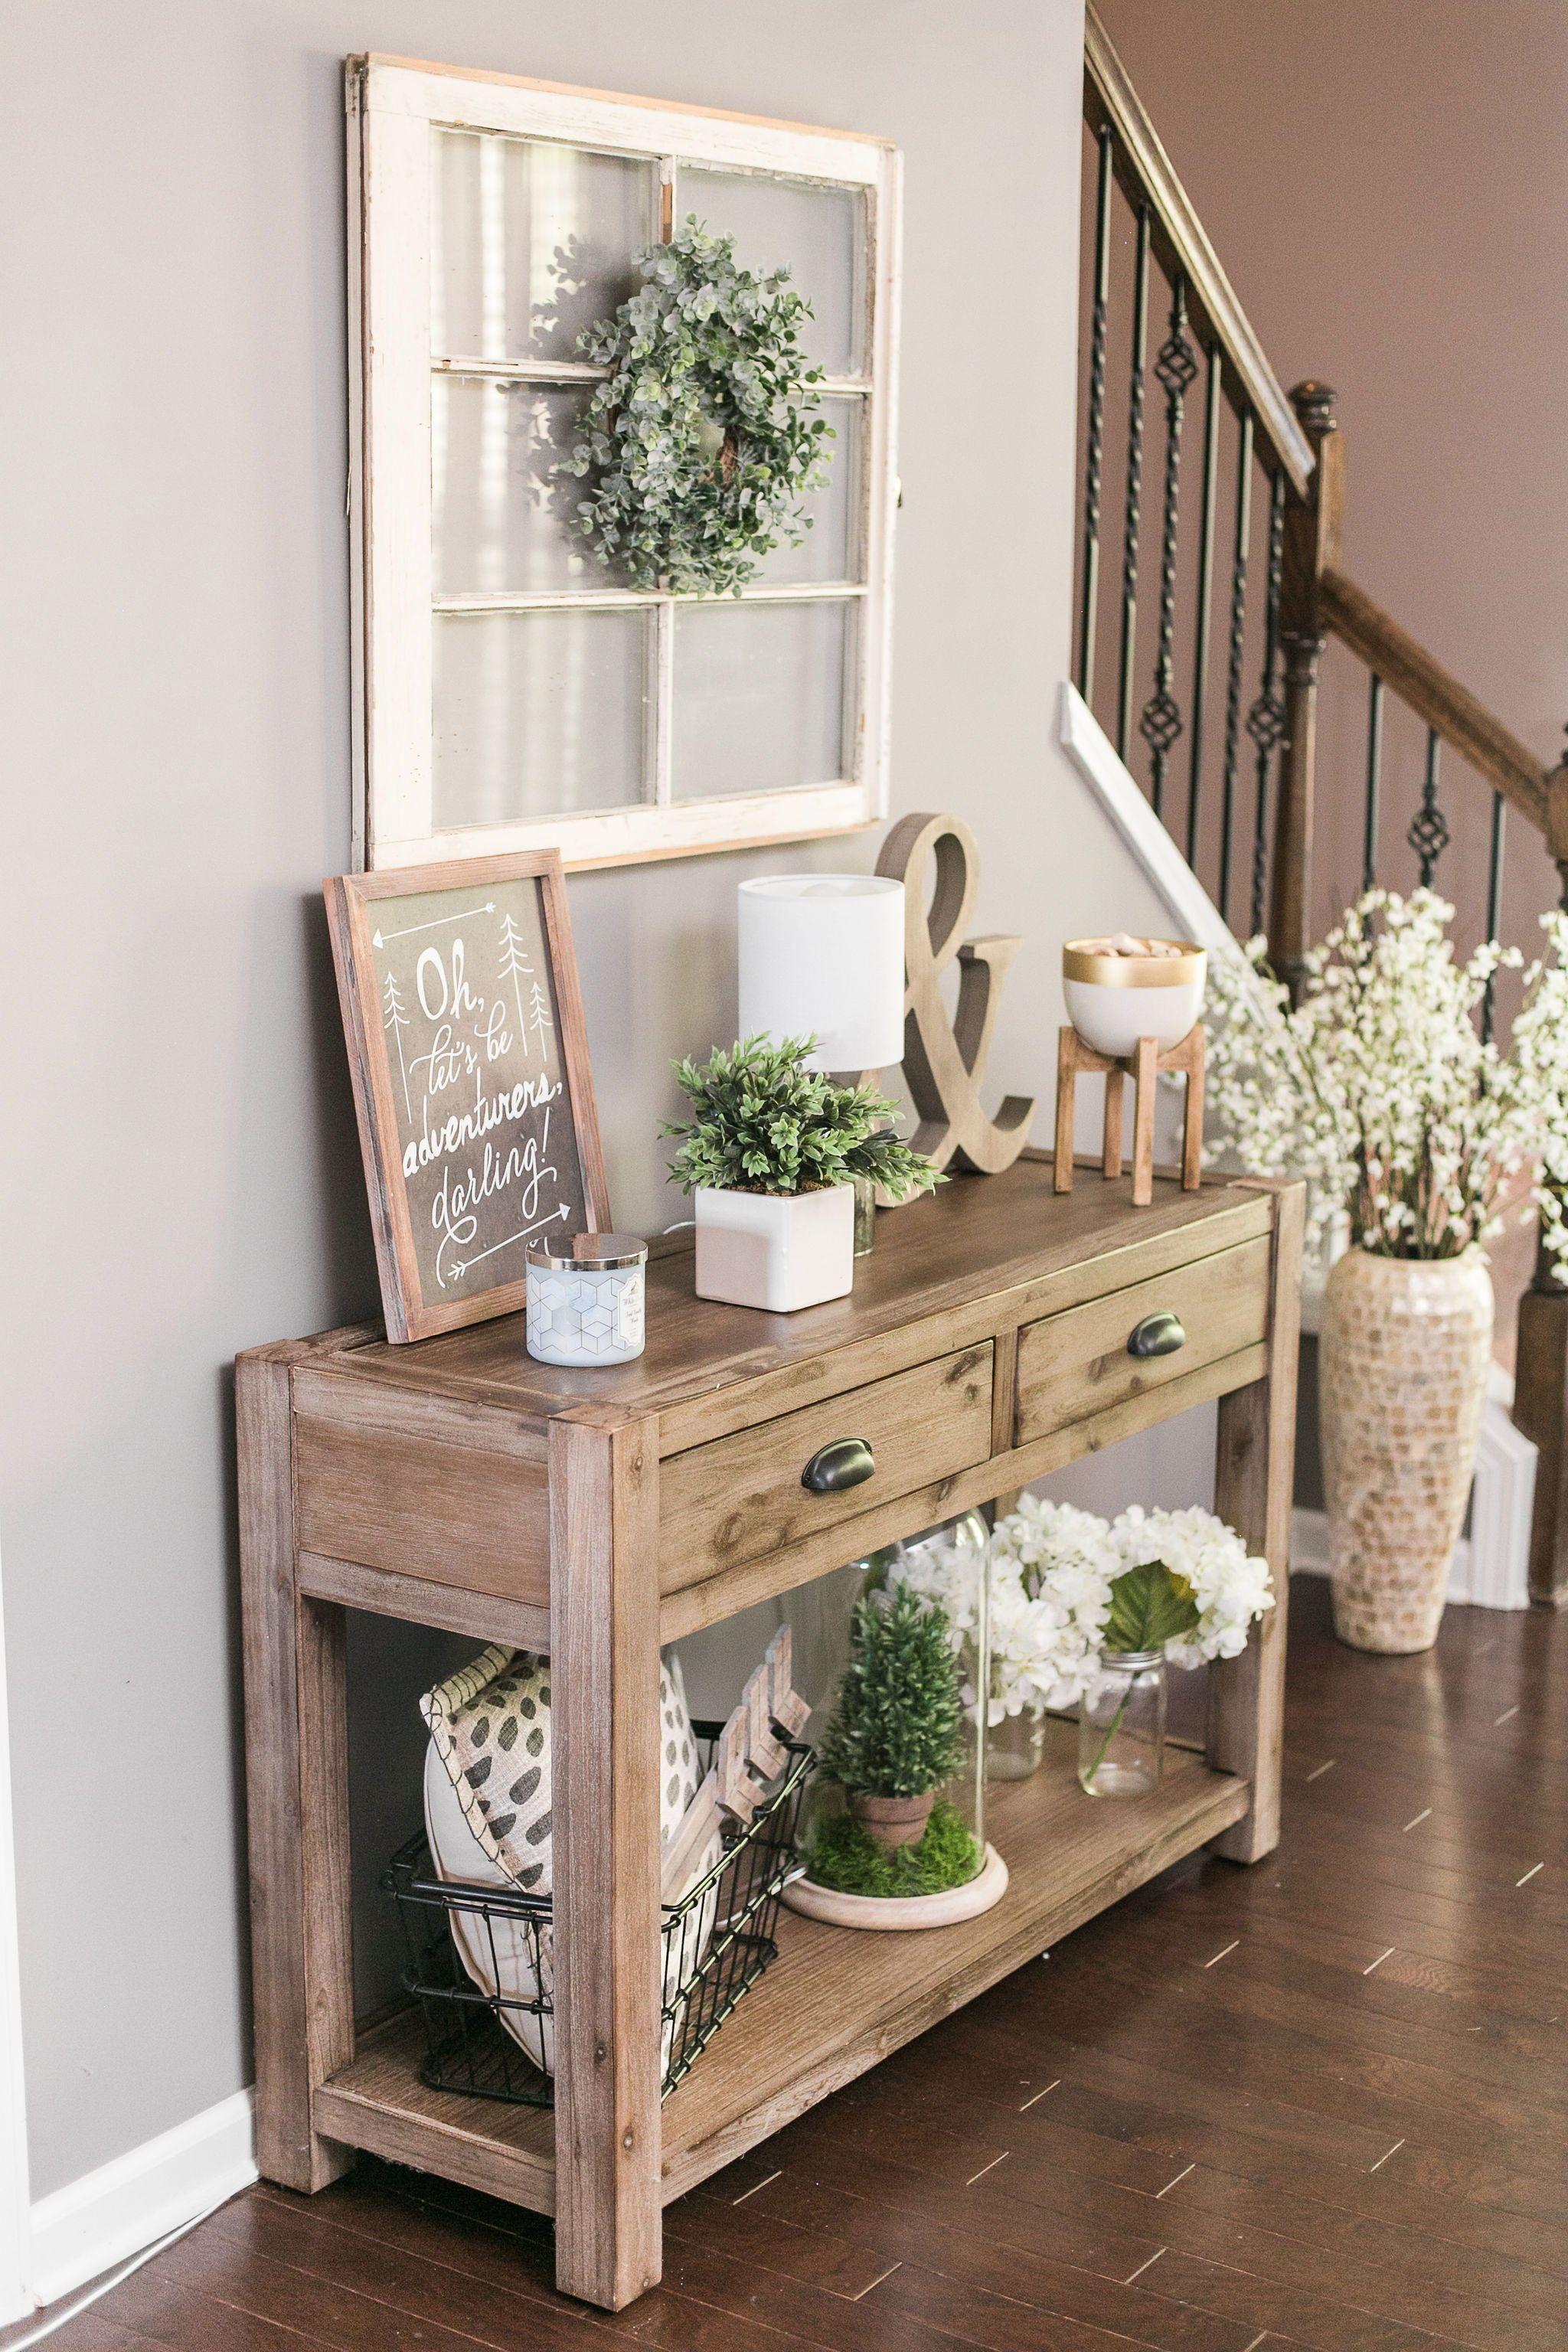 - Home Decor Eclectic Hippie Home Decor, Decor, Accent Table Decor